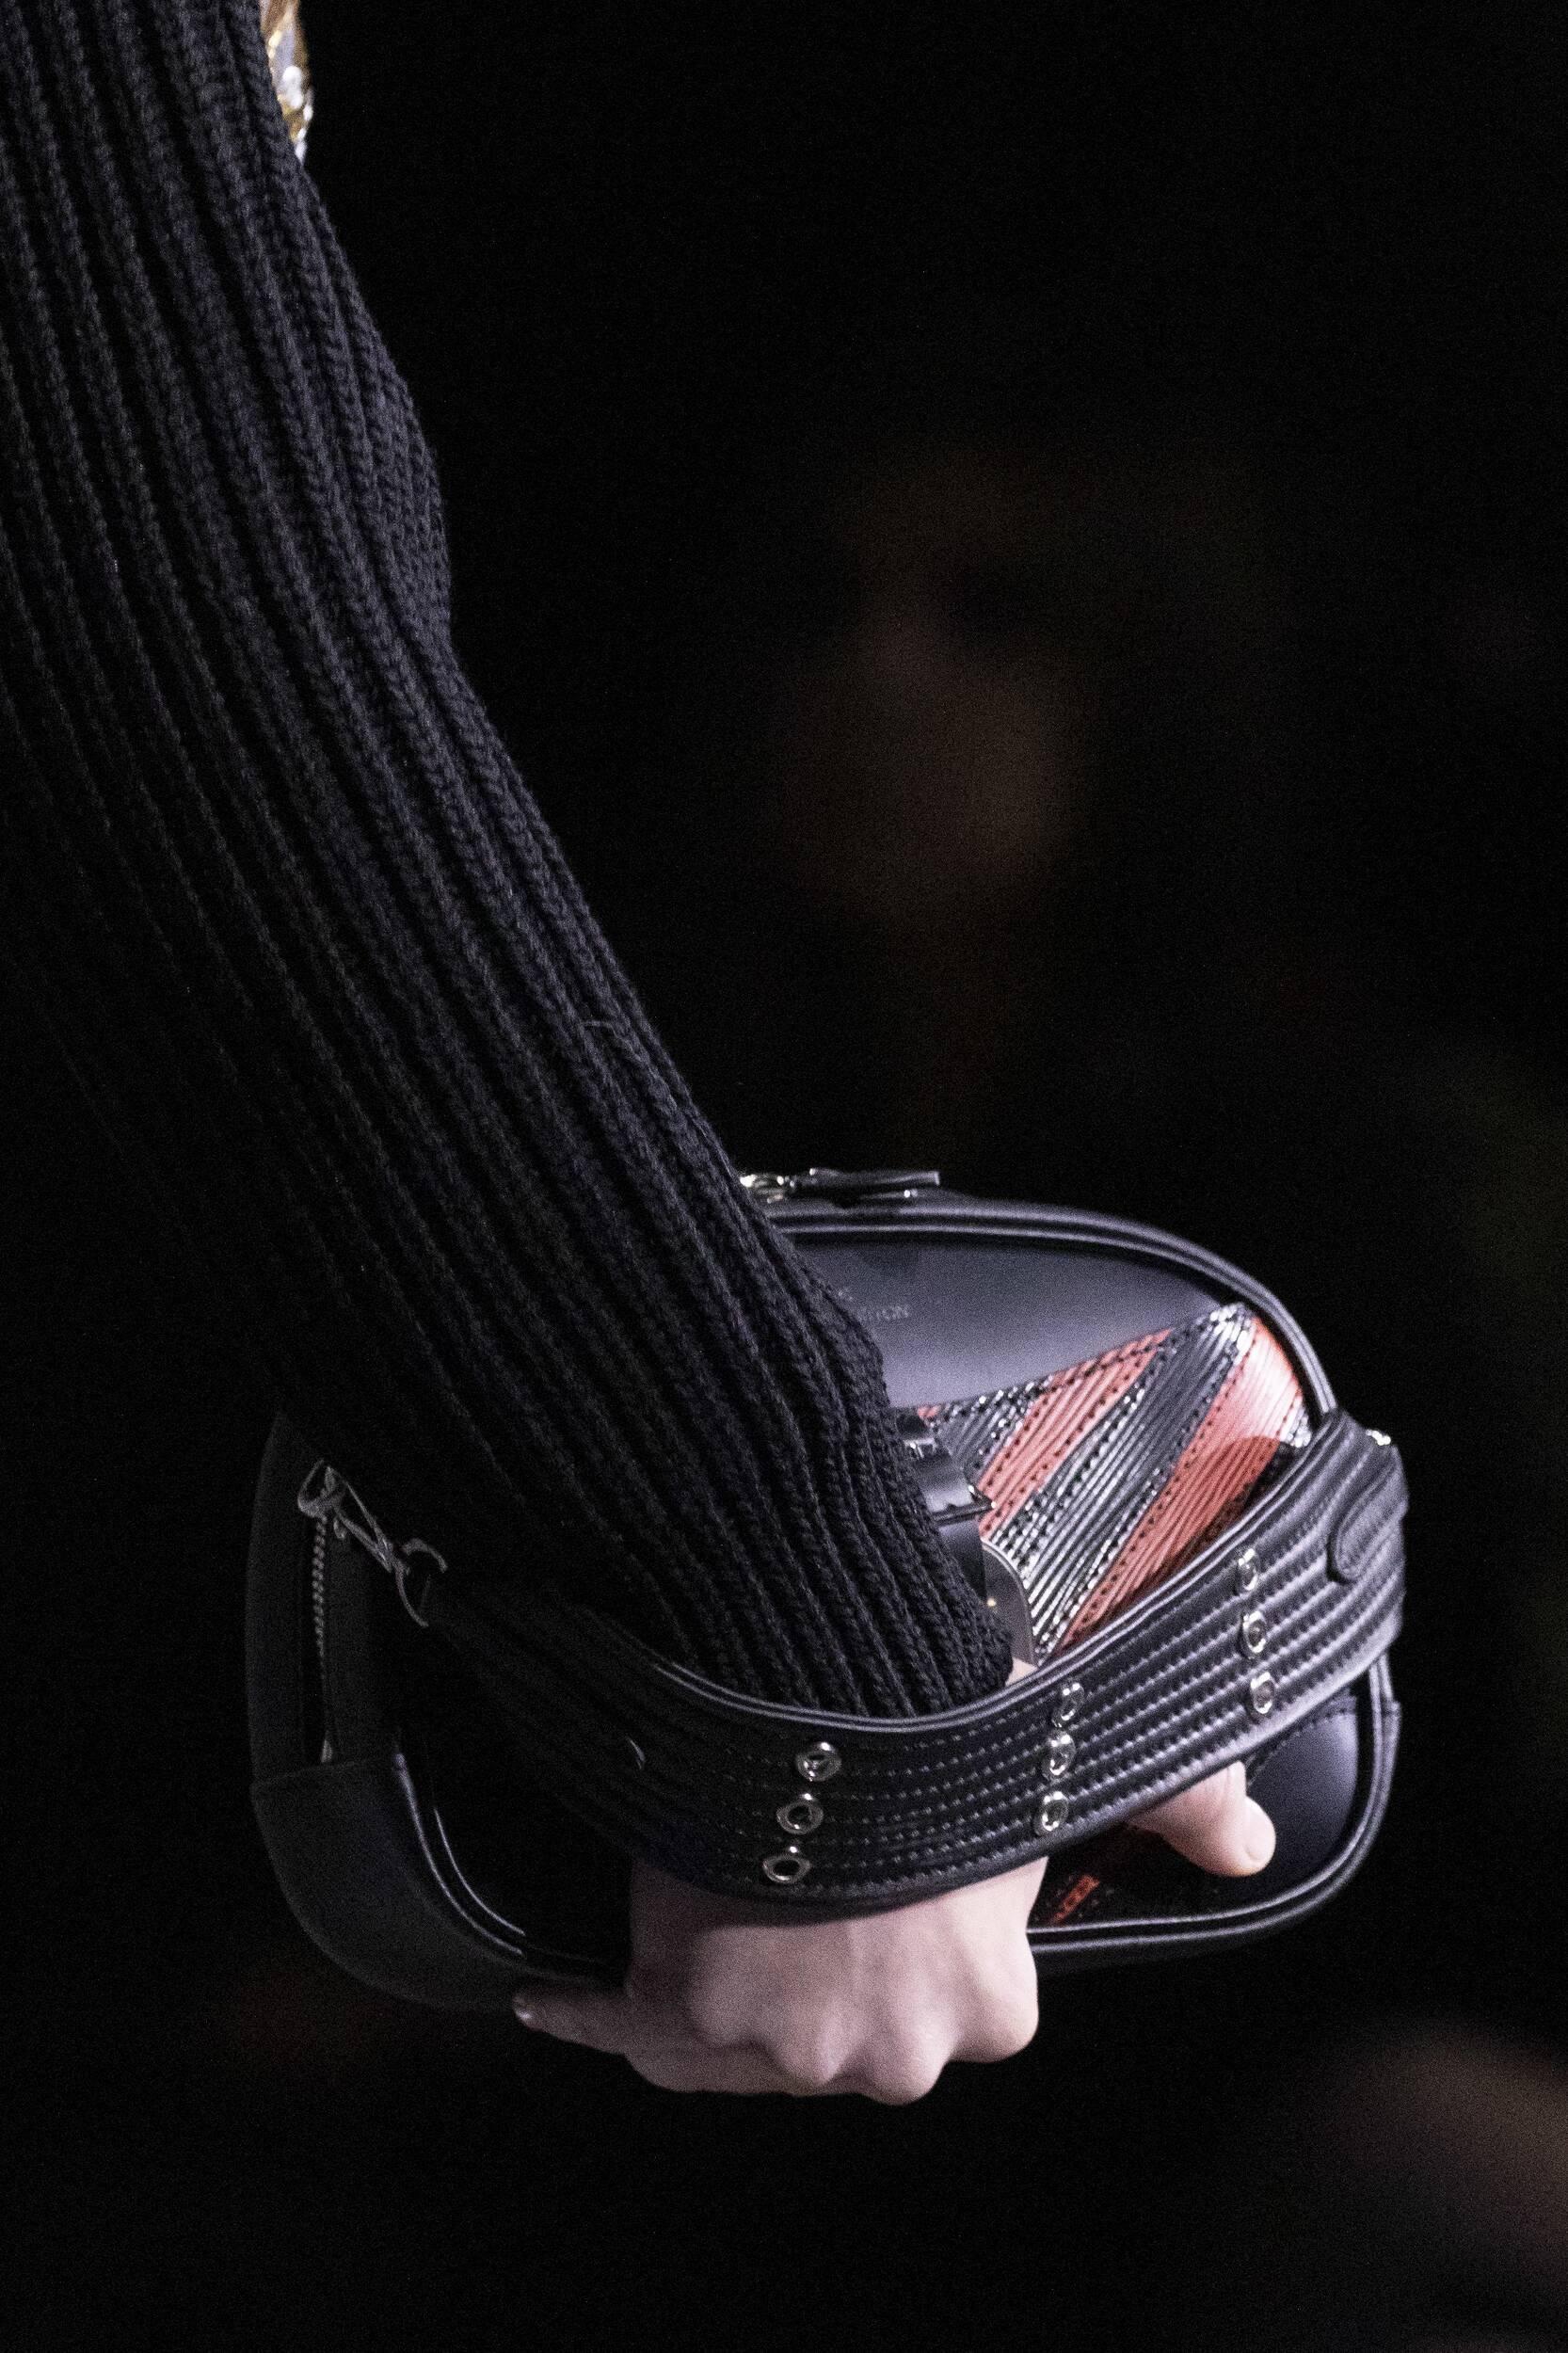 Louis Vuitton Womenswear Handbag Detail 2020-21